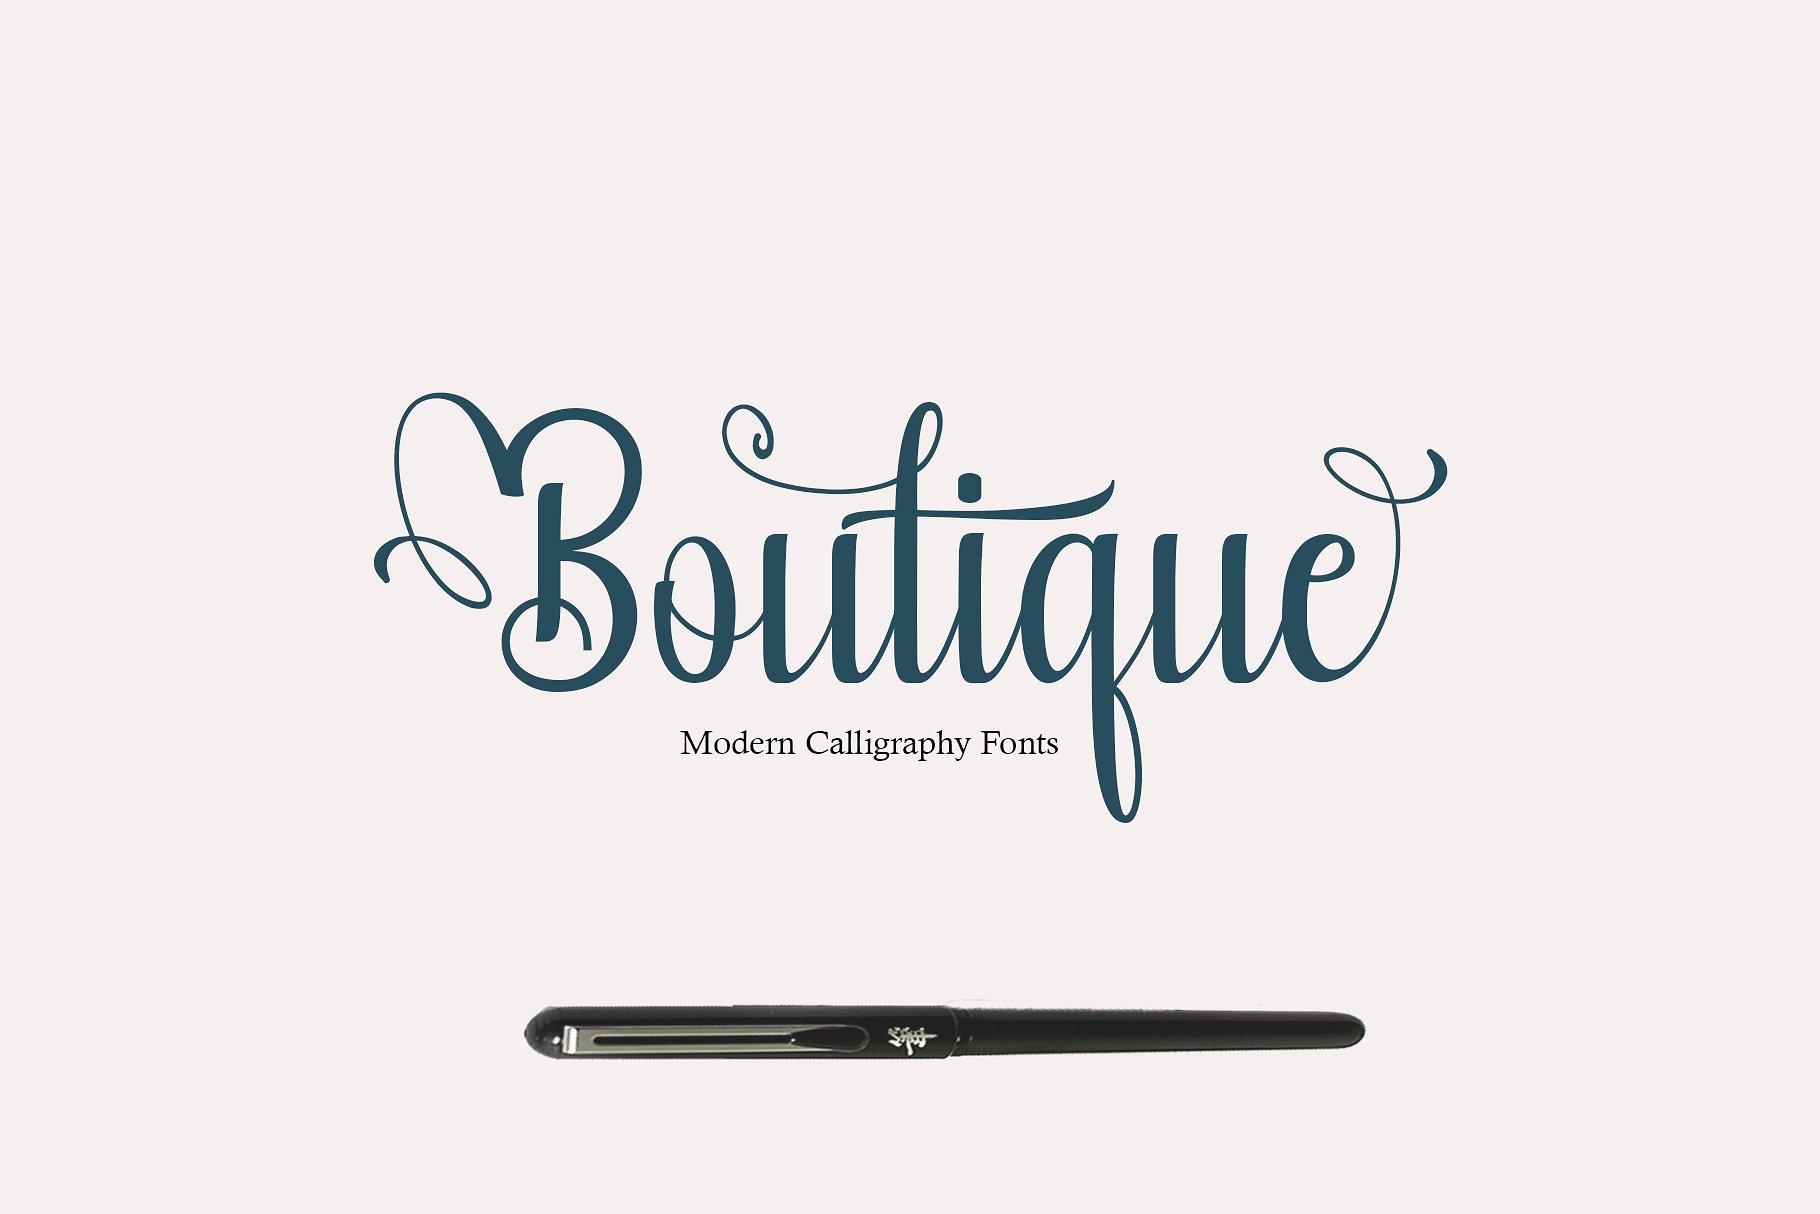 boutique-calligraphy-font